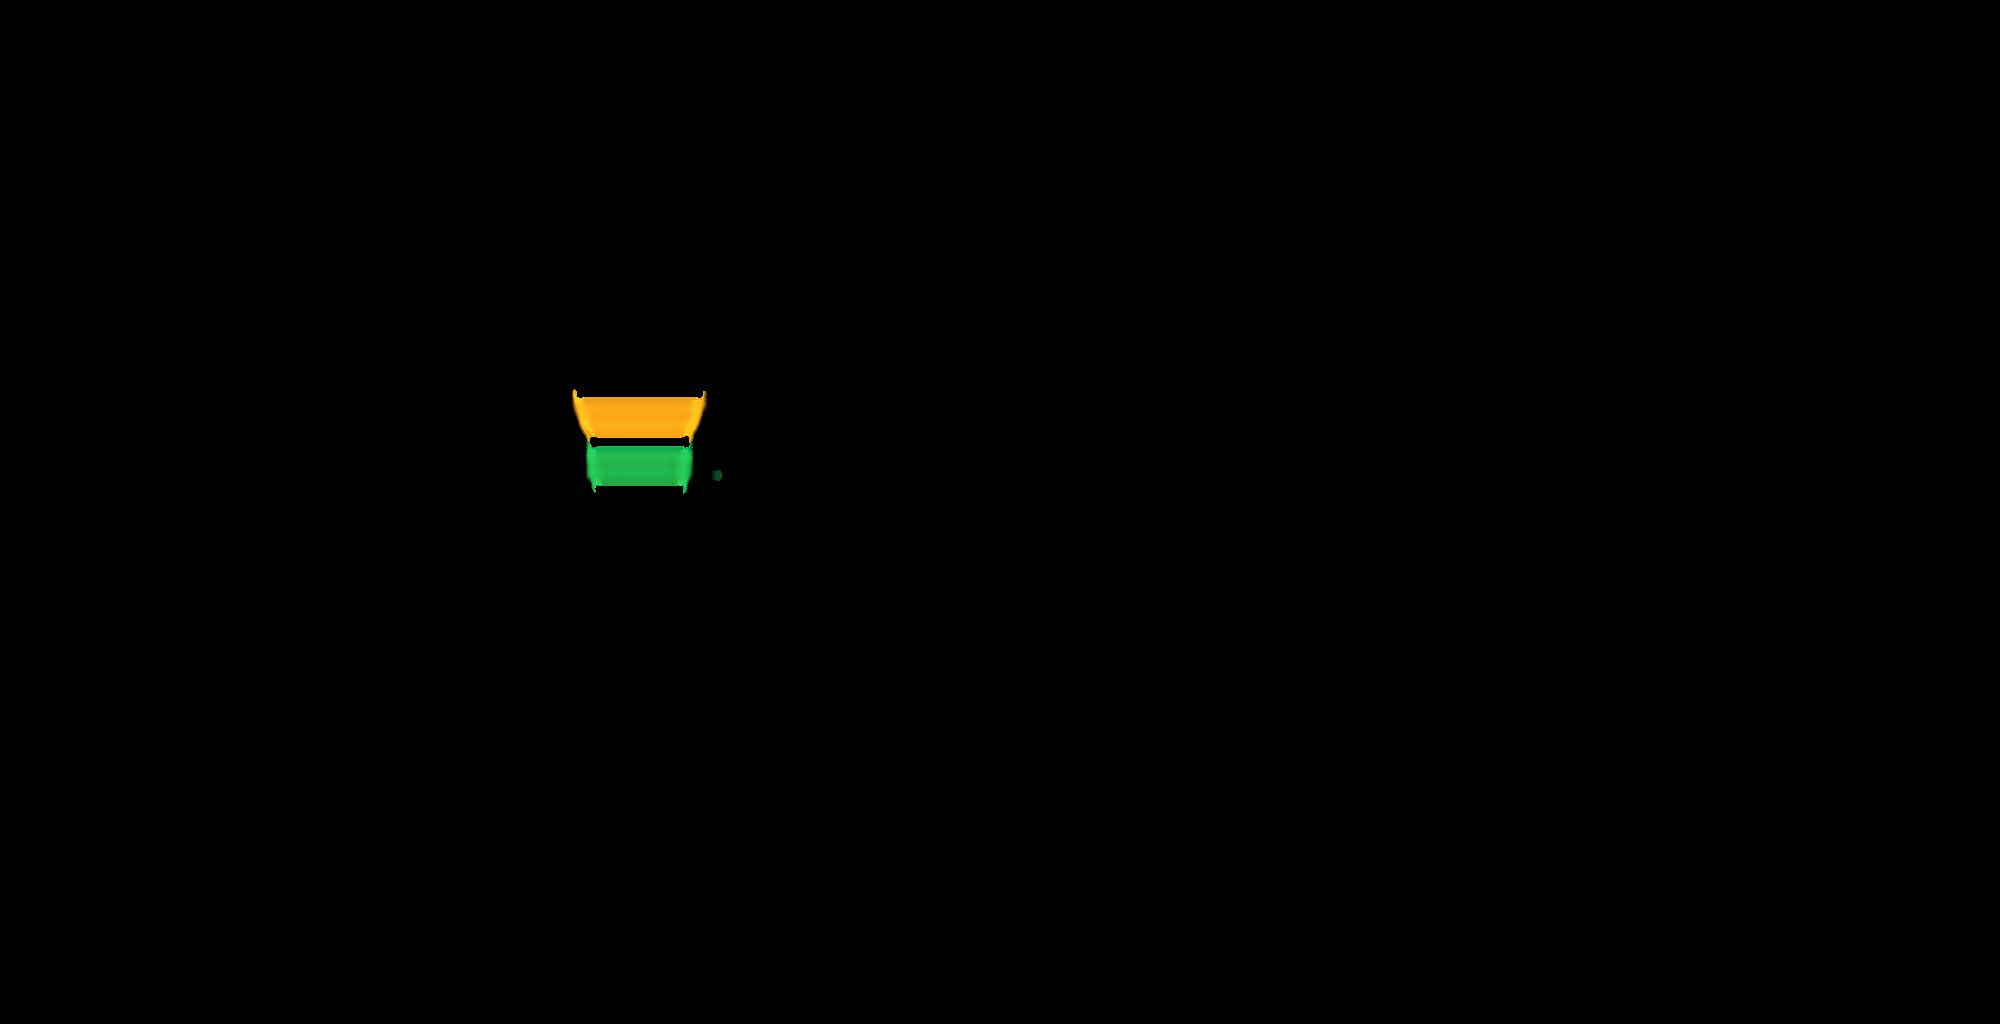 swatch bharat logo png